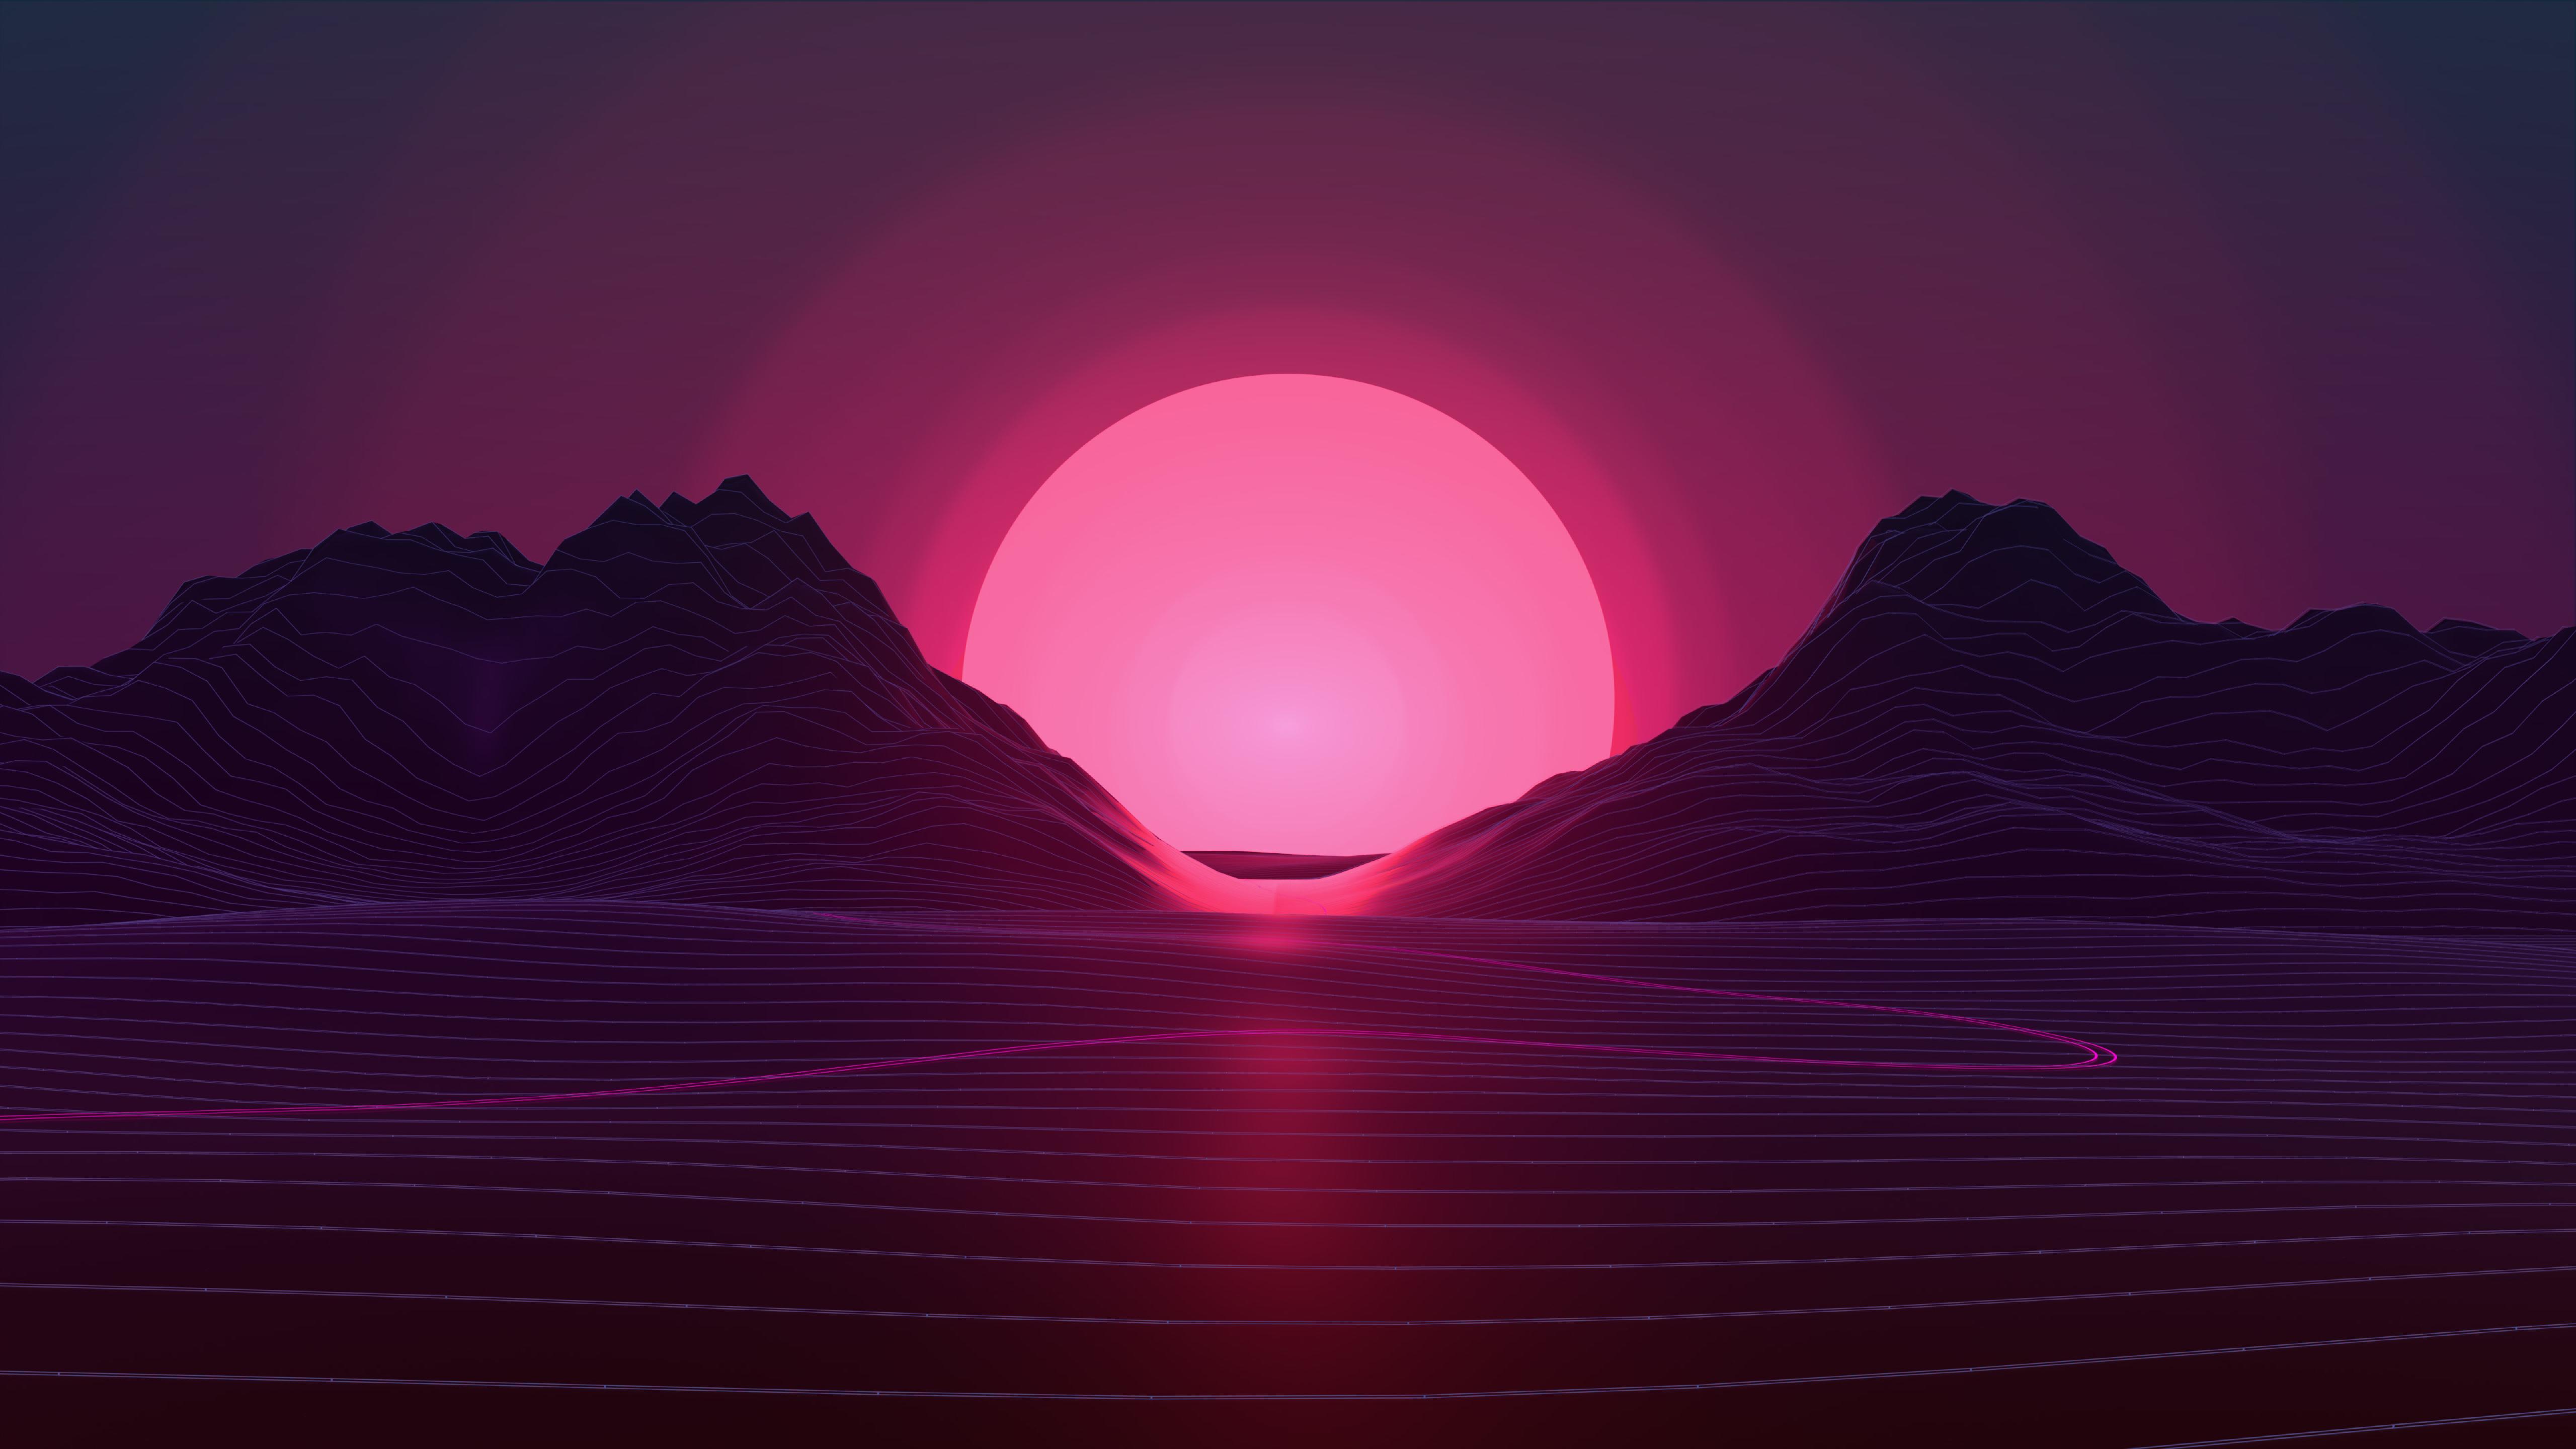 General 5120x2880 retrowave mountains purple sunrise sunset purple background pink abstract vaporwave